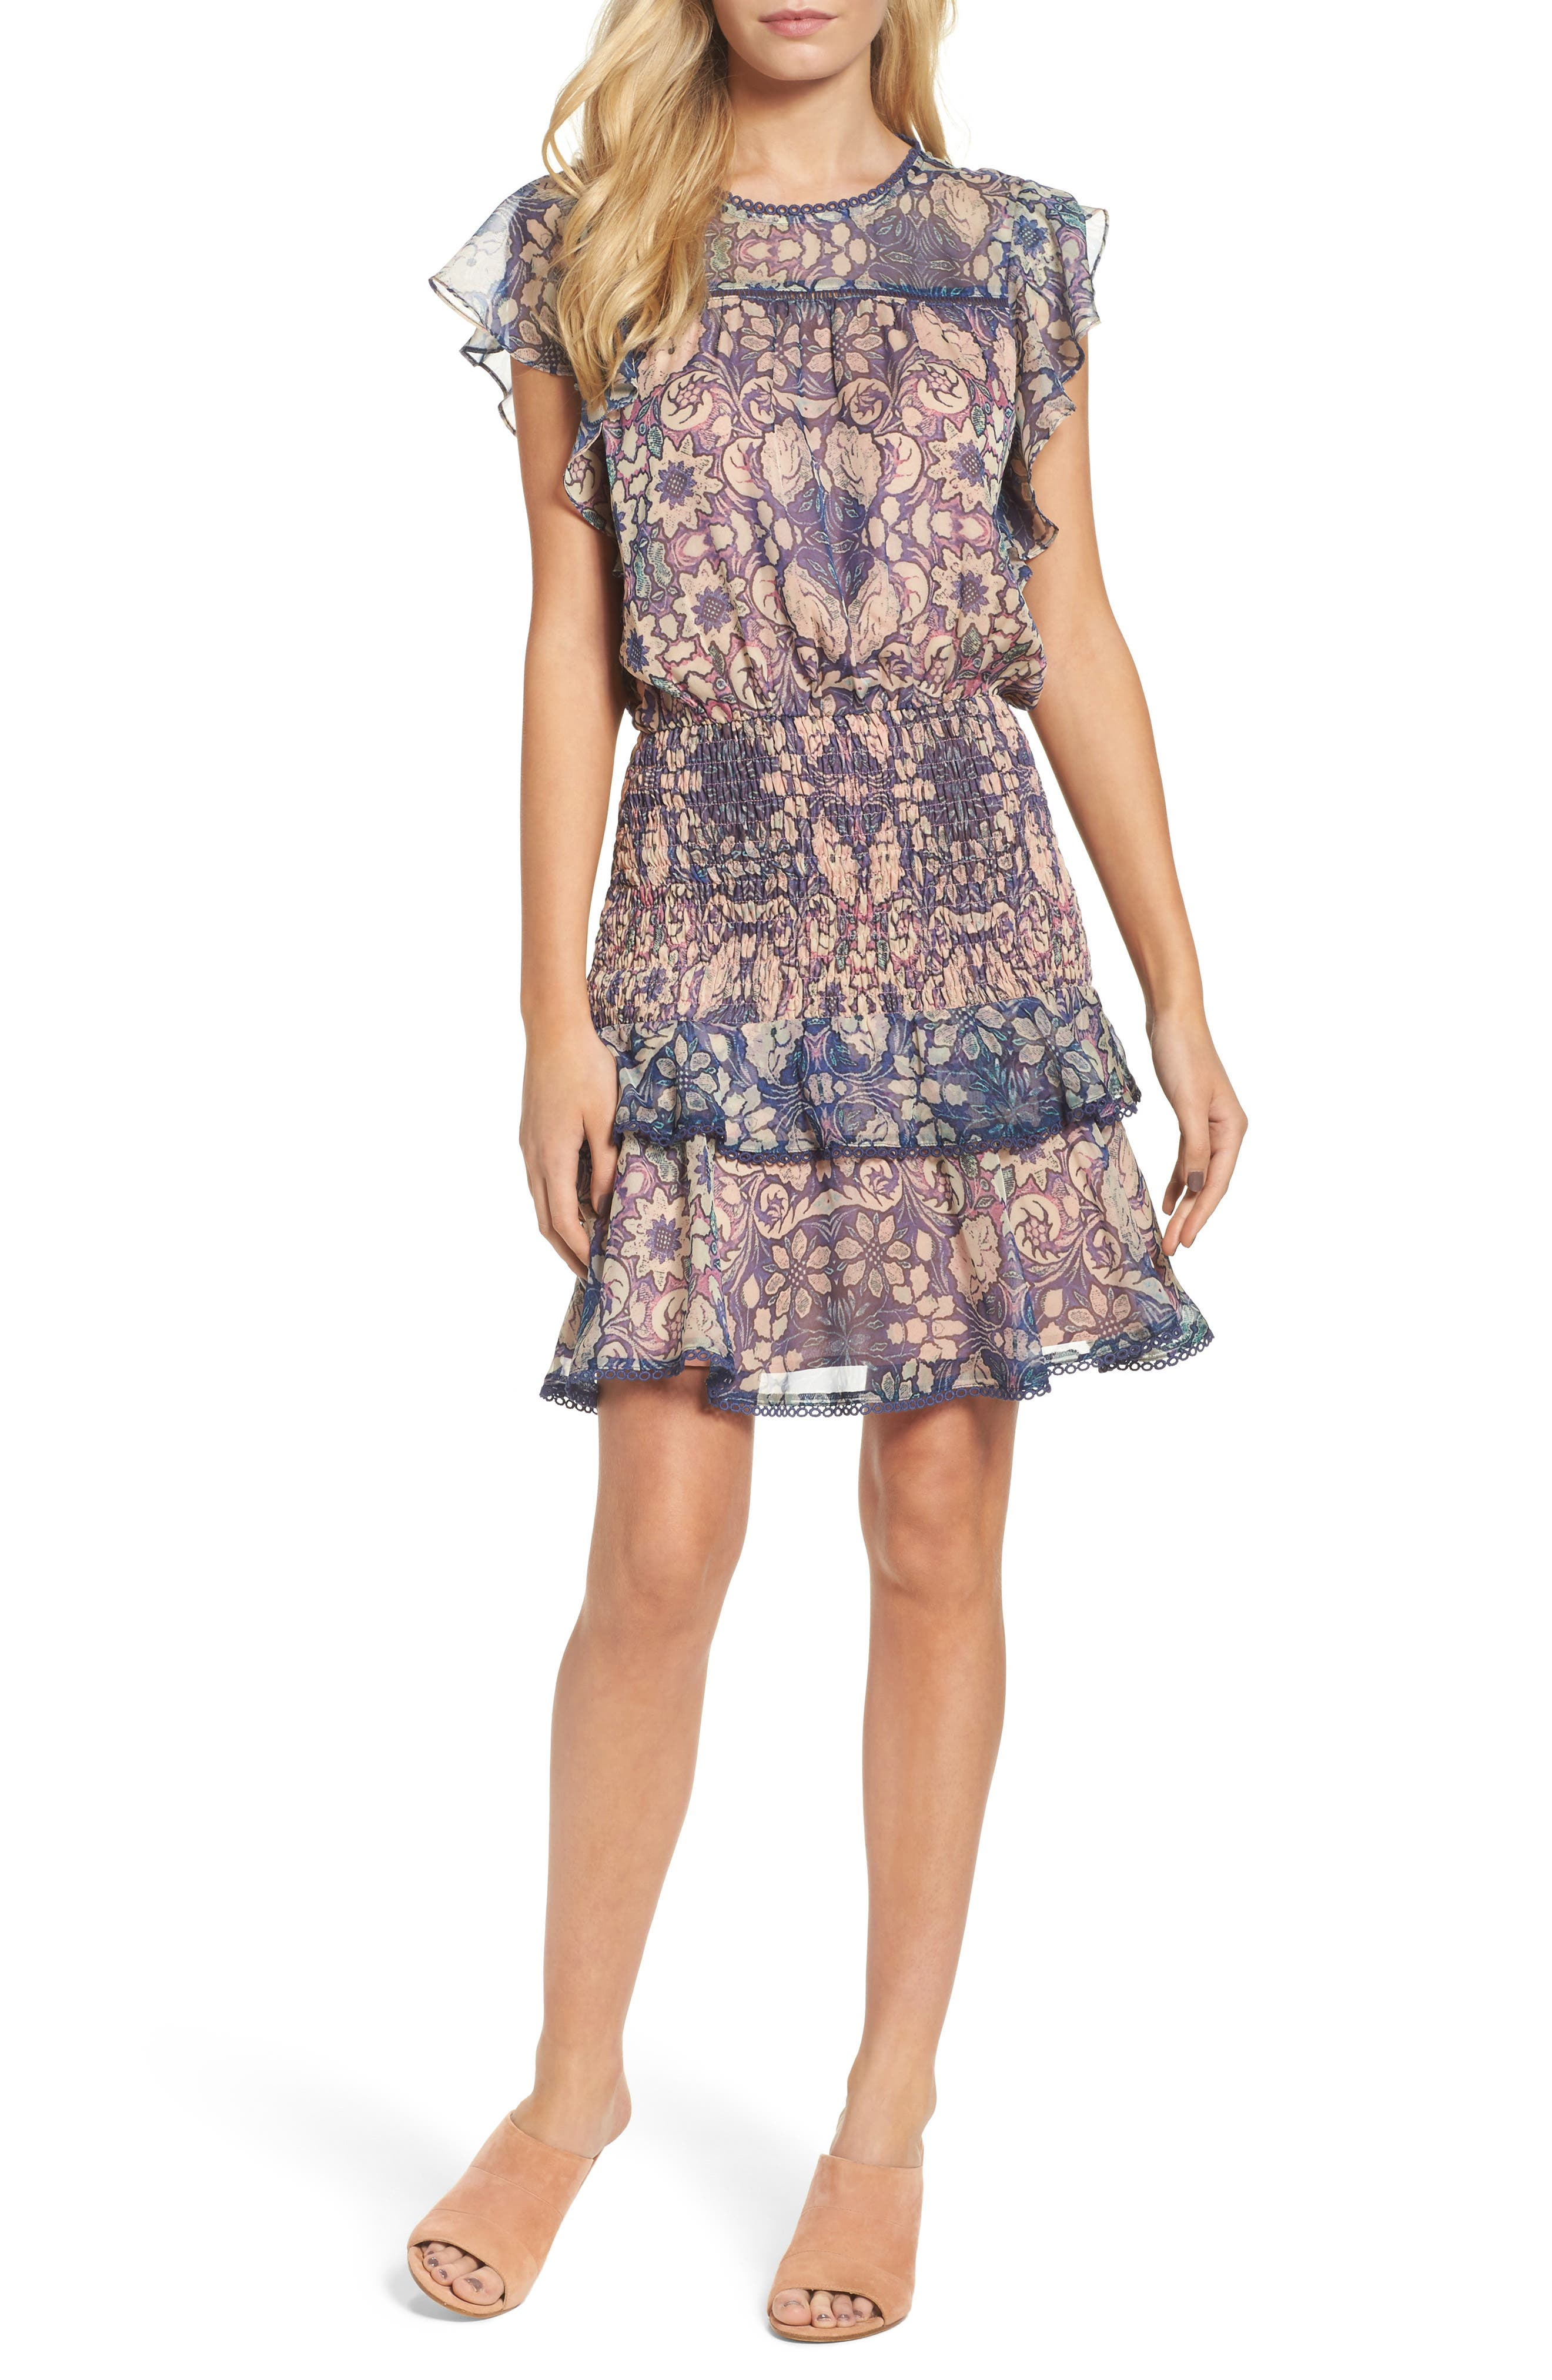 Main Image - Chelsea28 Tiered Blouson Dress